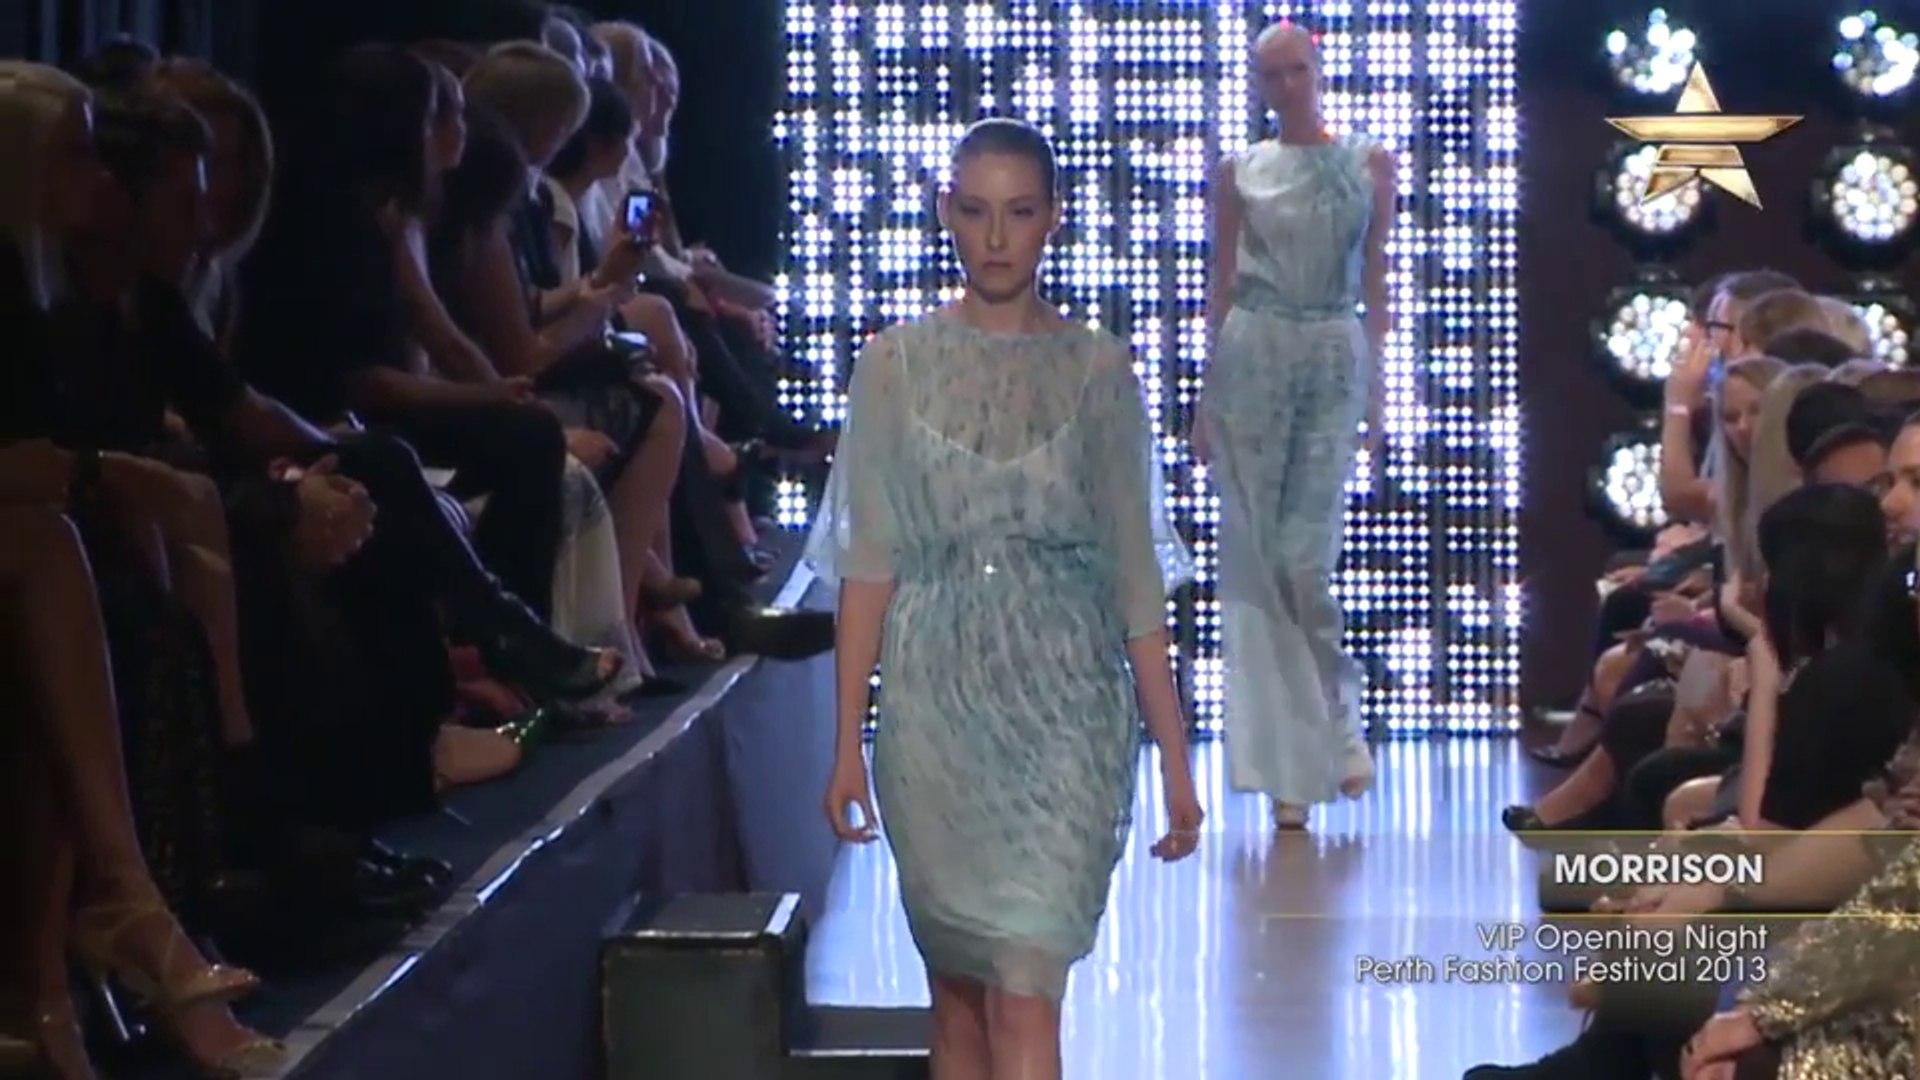 Fashion Week MORRISON Perth Fashion Festival 2013